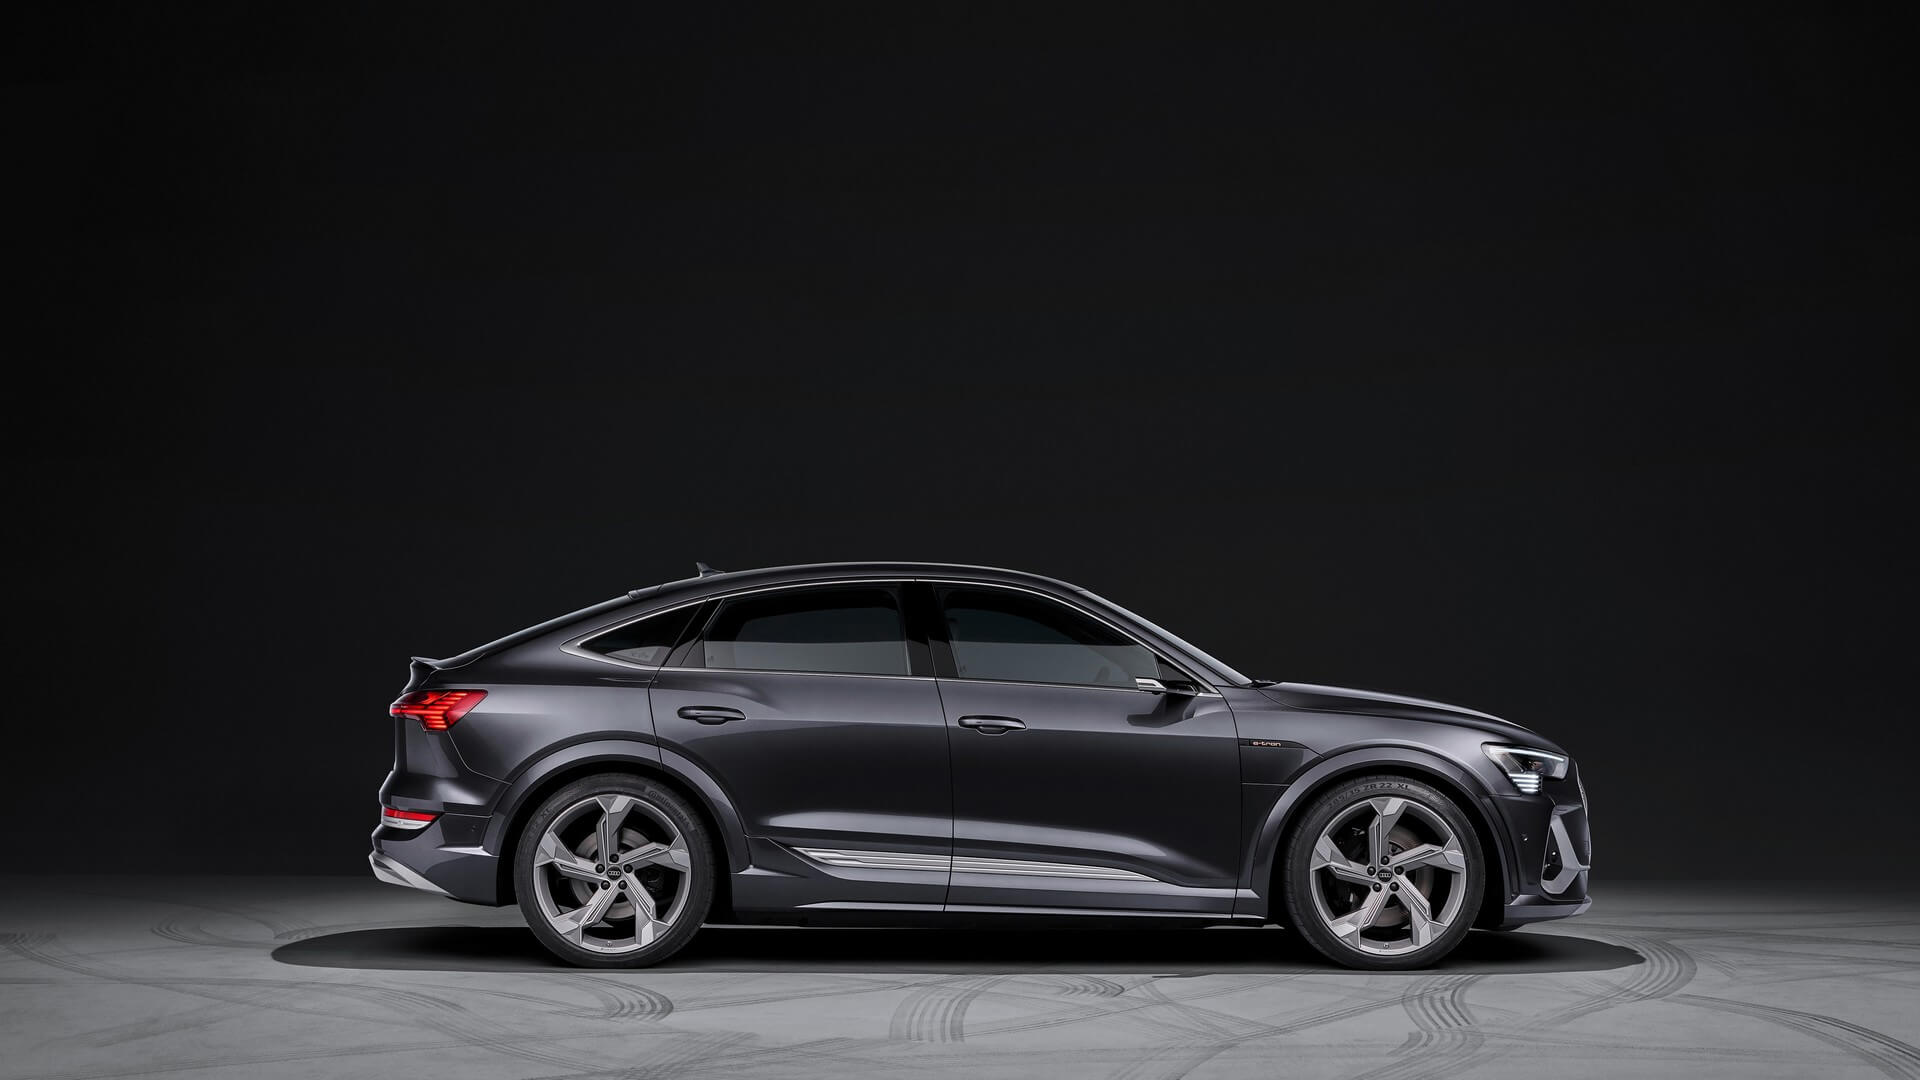 Audi-E-Tron-S-and-E-Tron-S-Sportback-2020-63